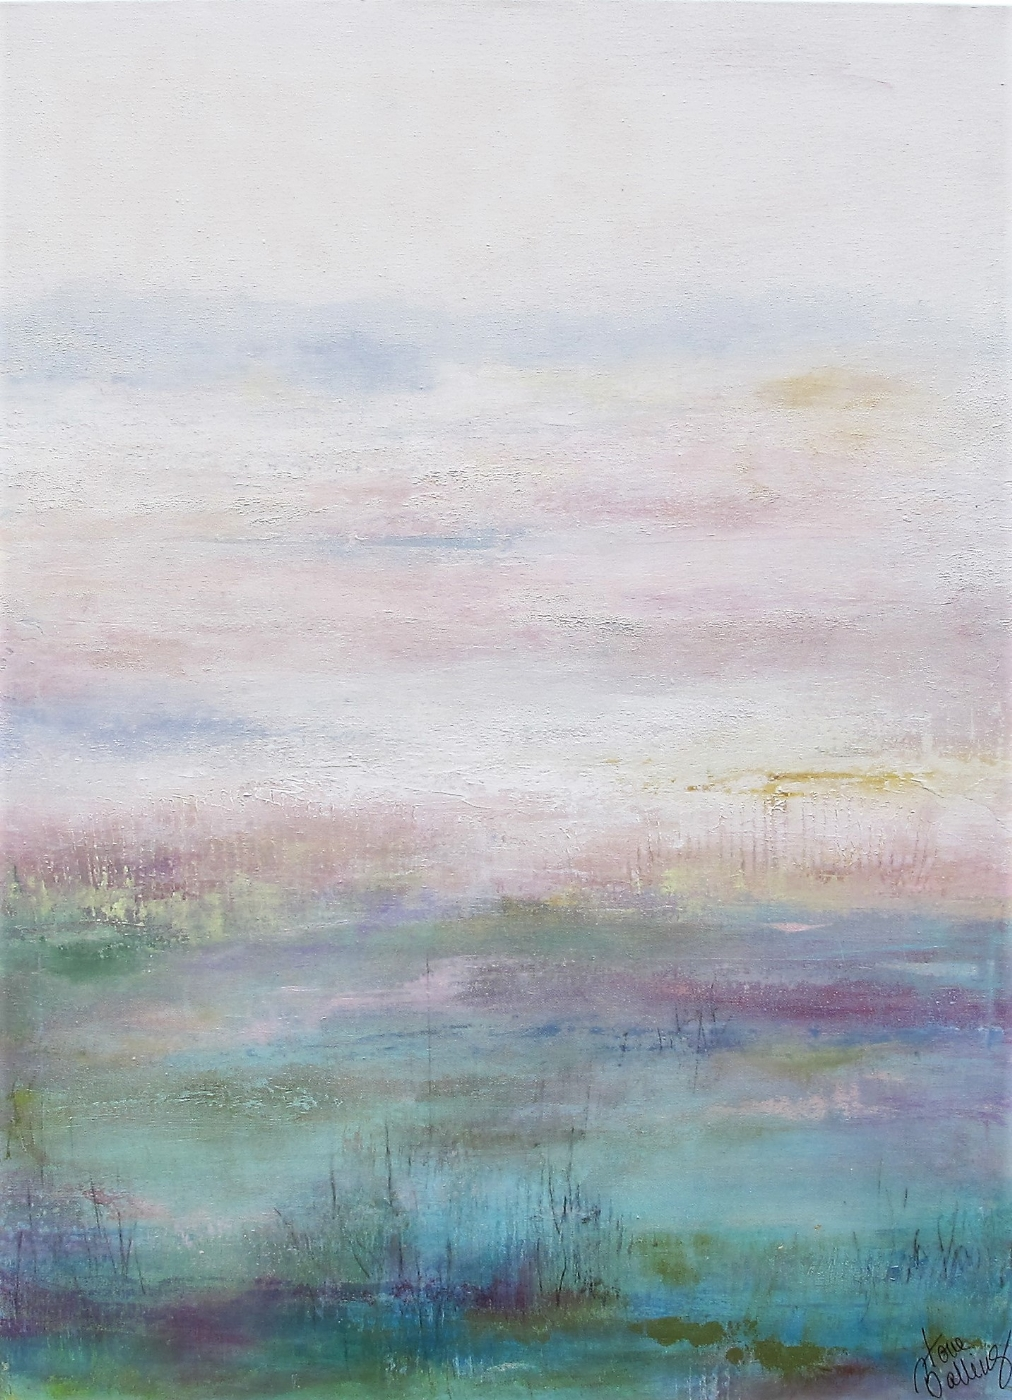 lyst landskab 2 | Maleri